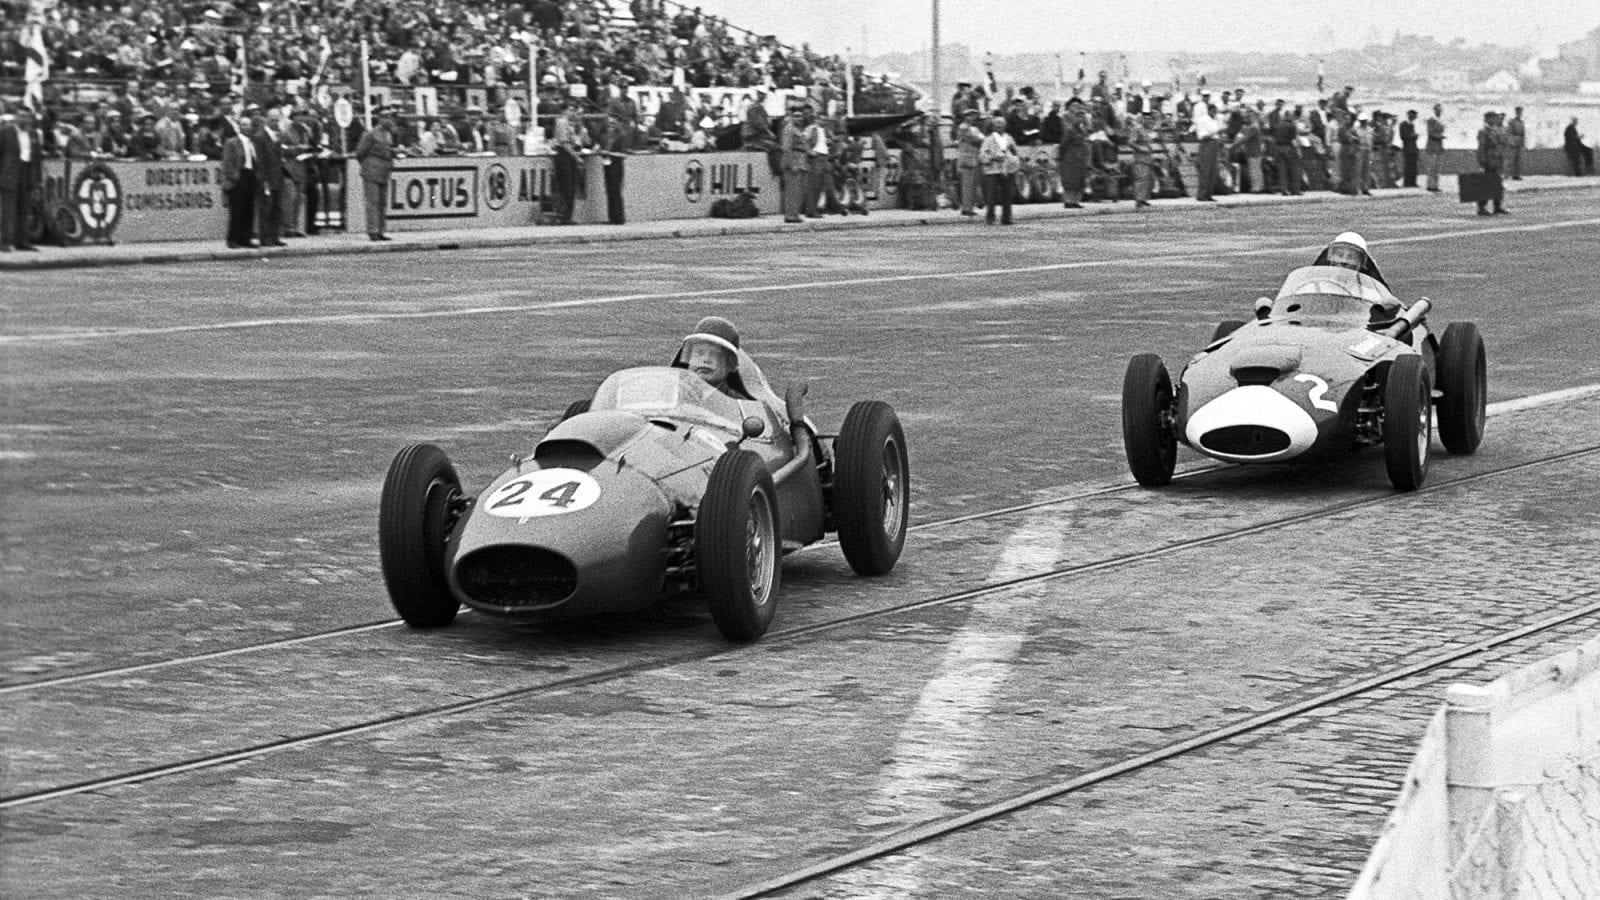 1958 Portuguese Grand Prix Hawthorn and Moss